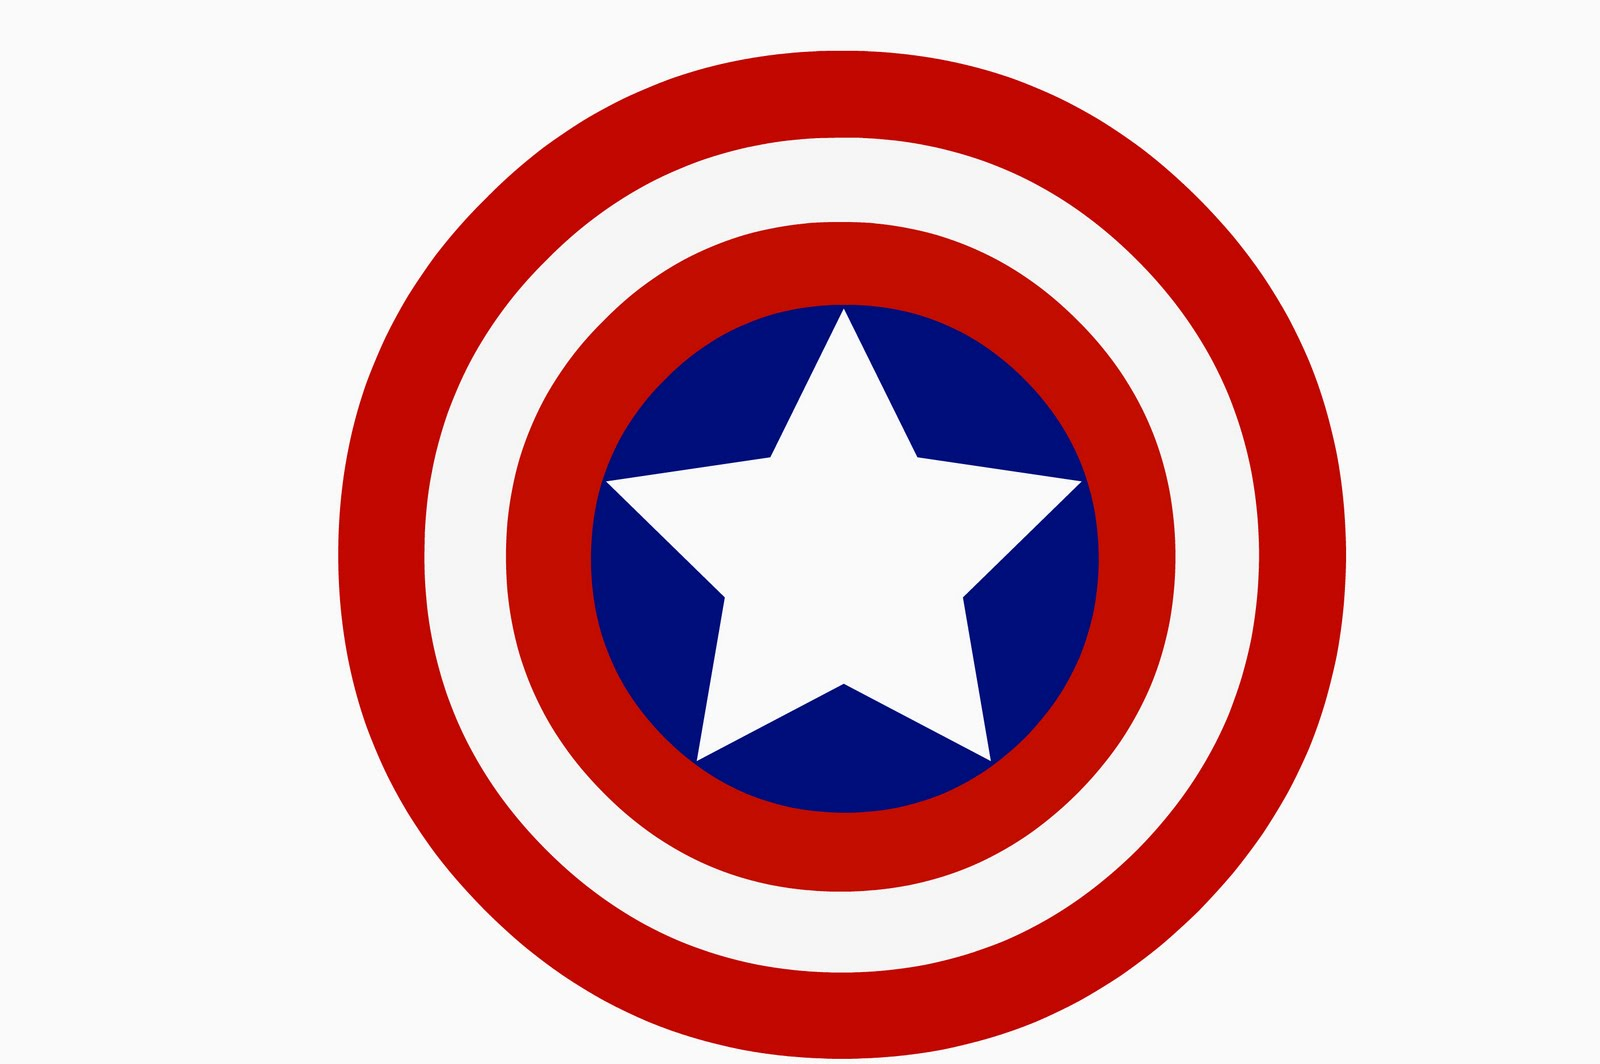 Related Logos For Captain America Logo-Related Logos For Captain America Logo-18